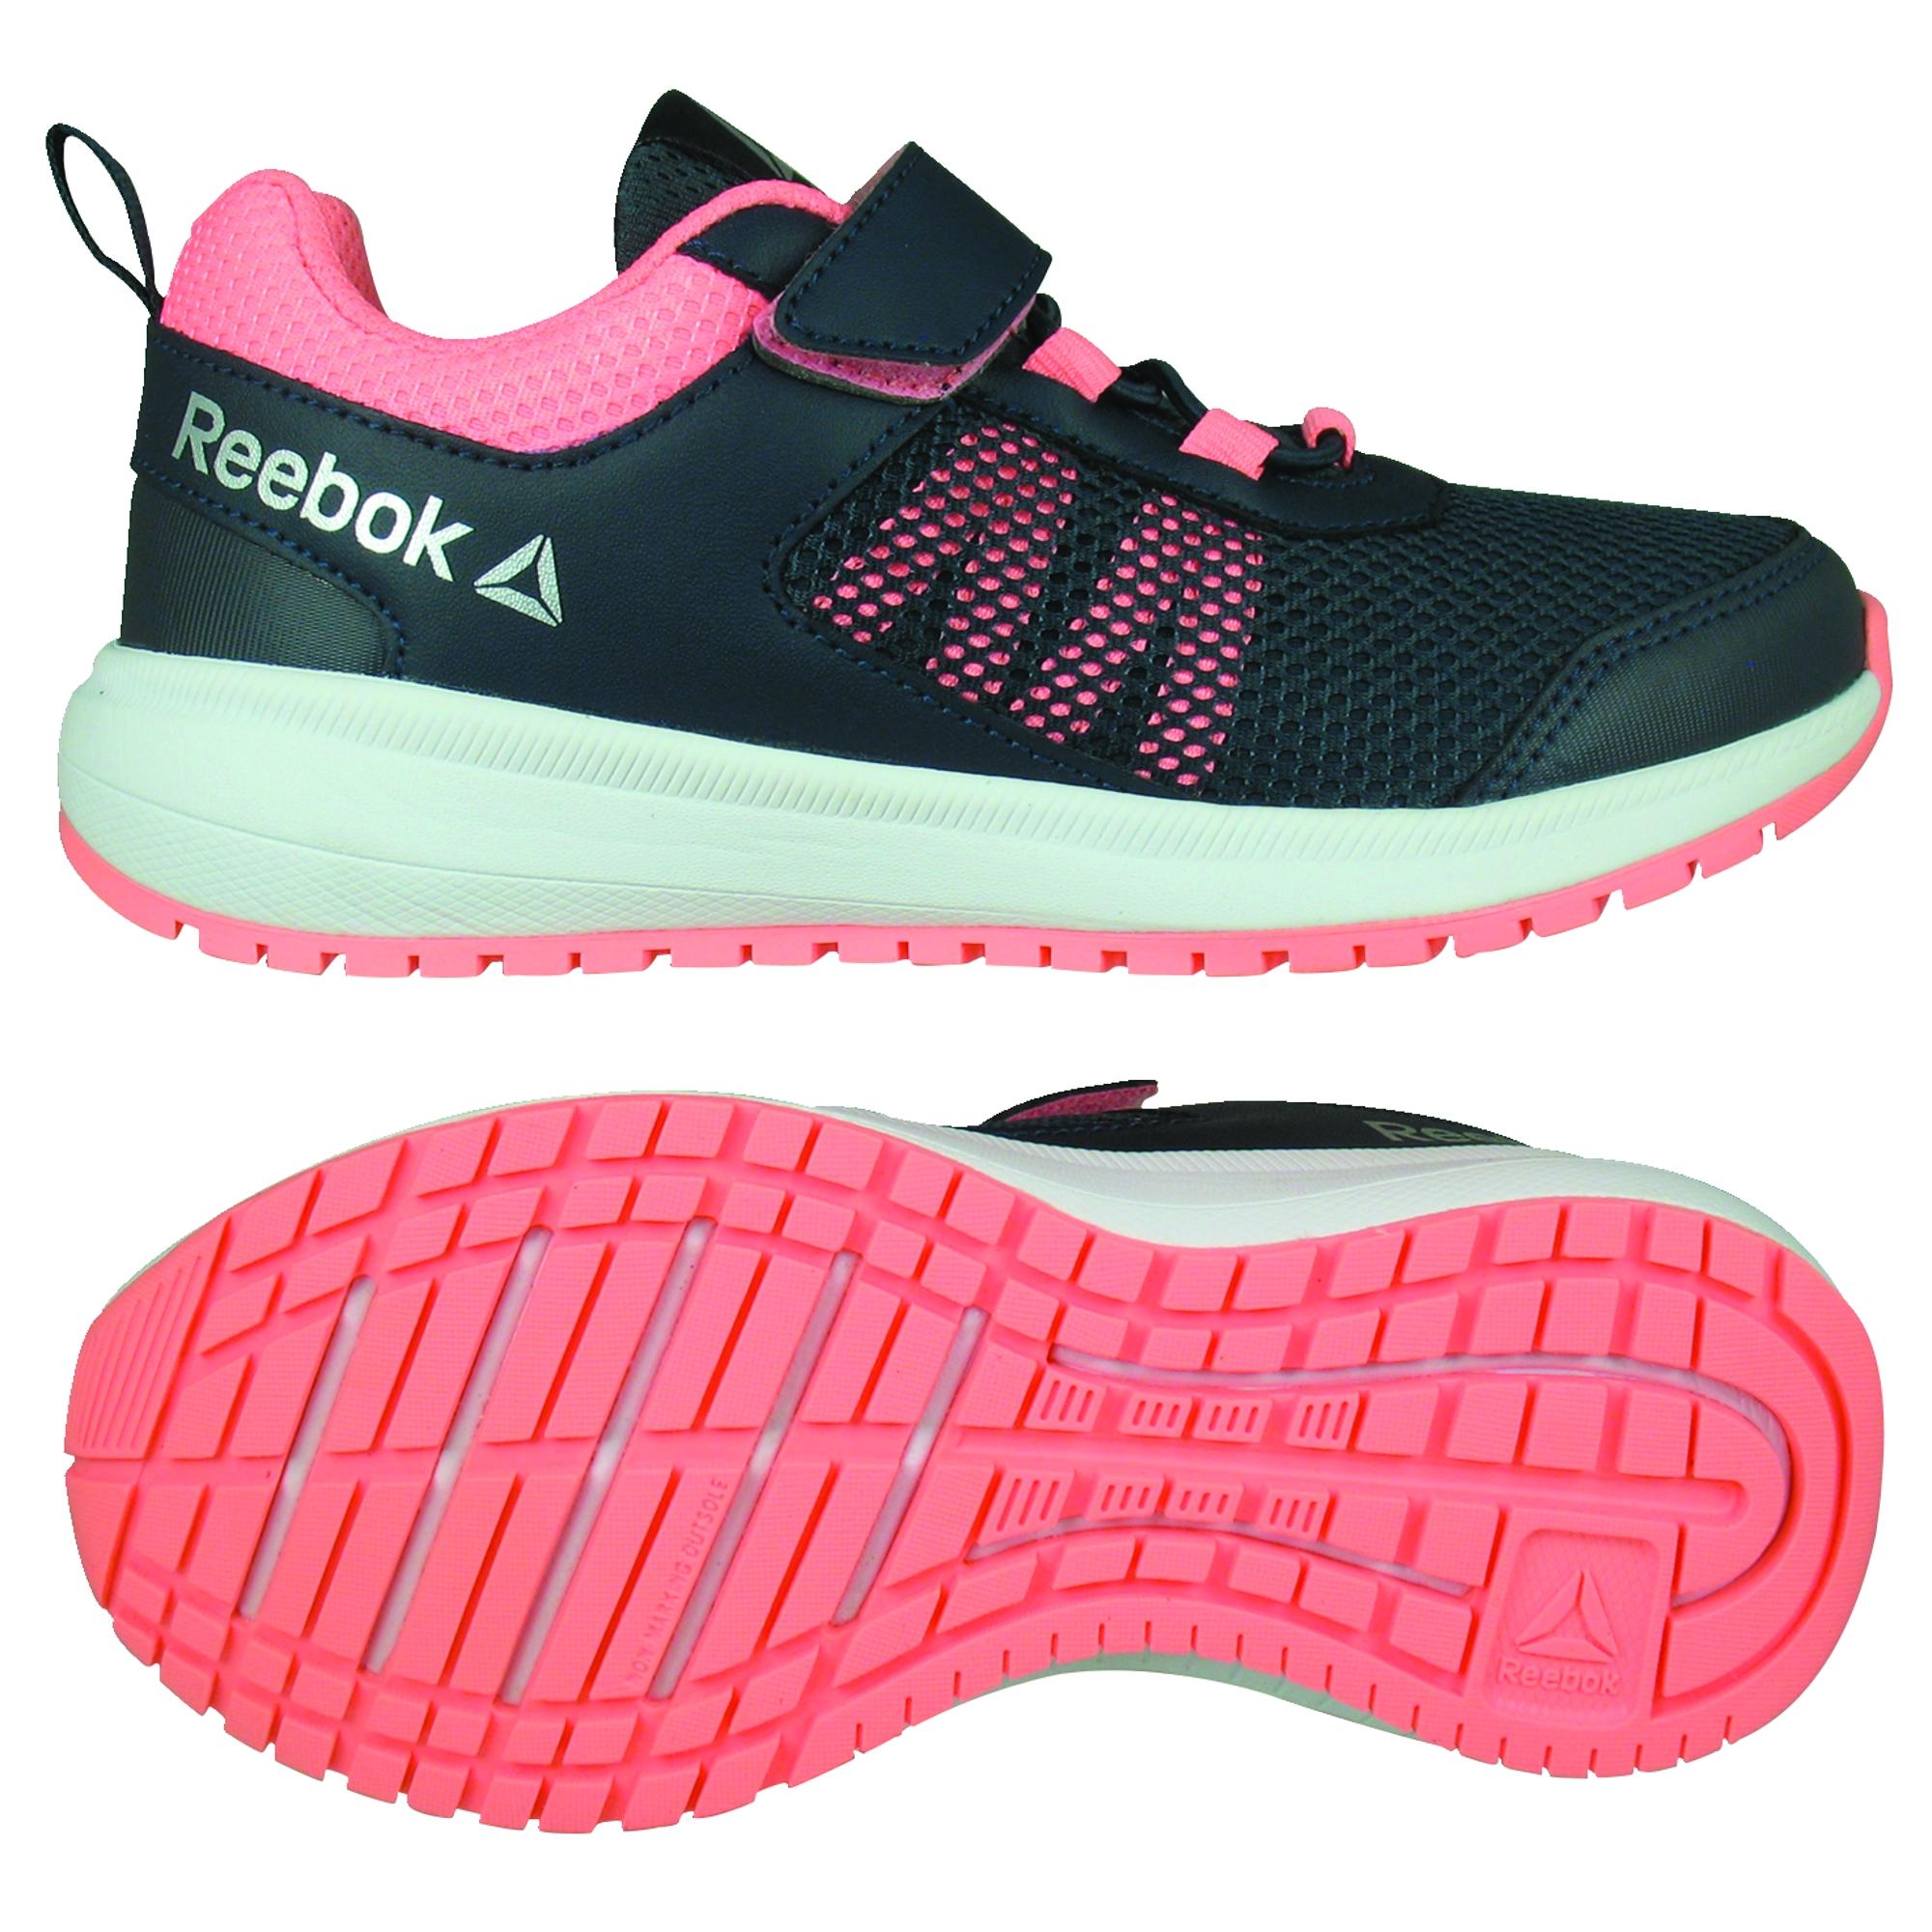 d3da79d1ed46d5 Chaussures kid femme Reebok Road Supreme Alt